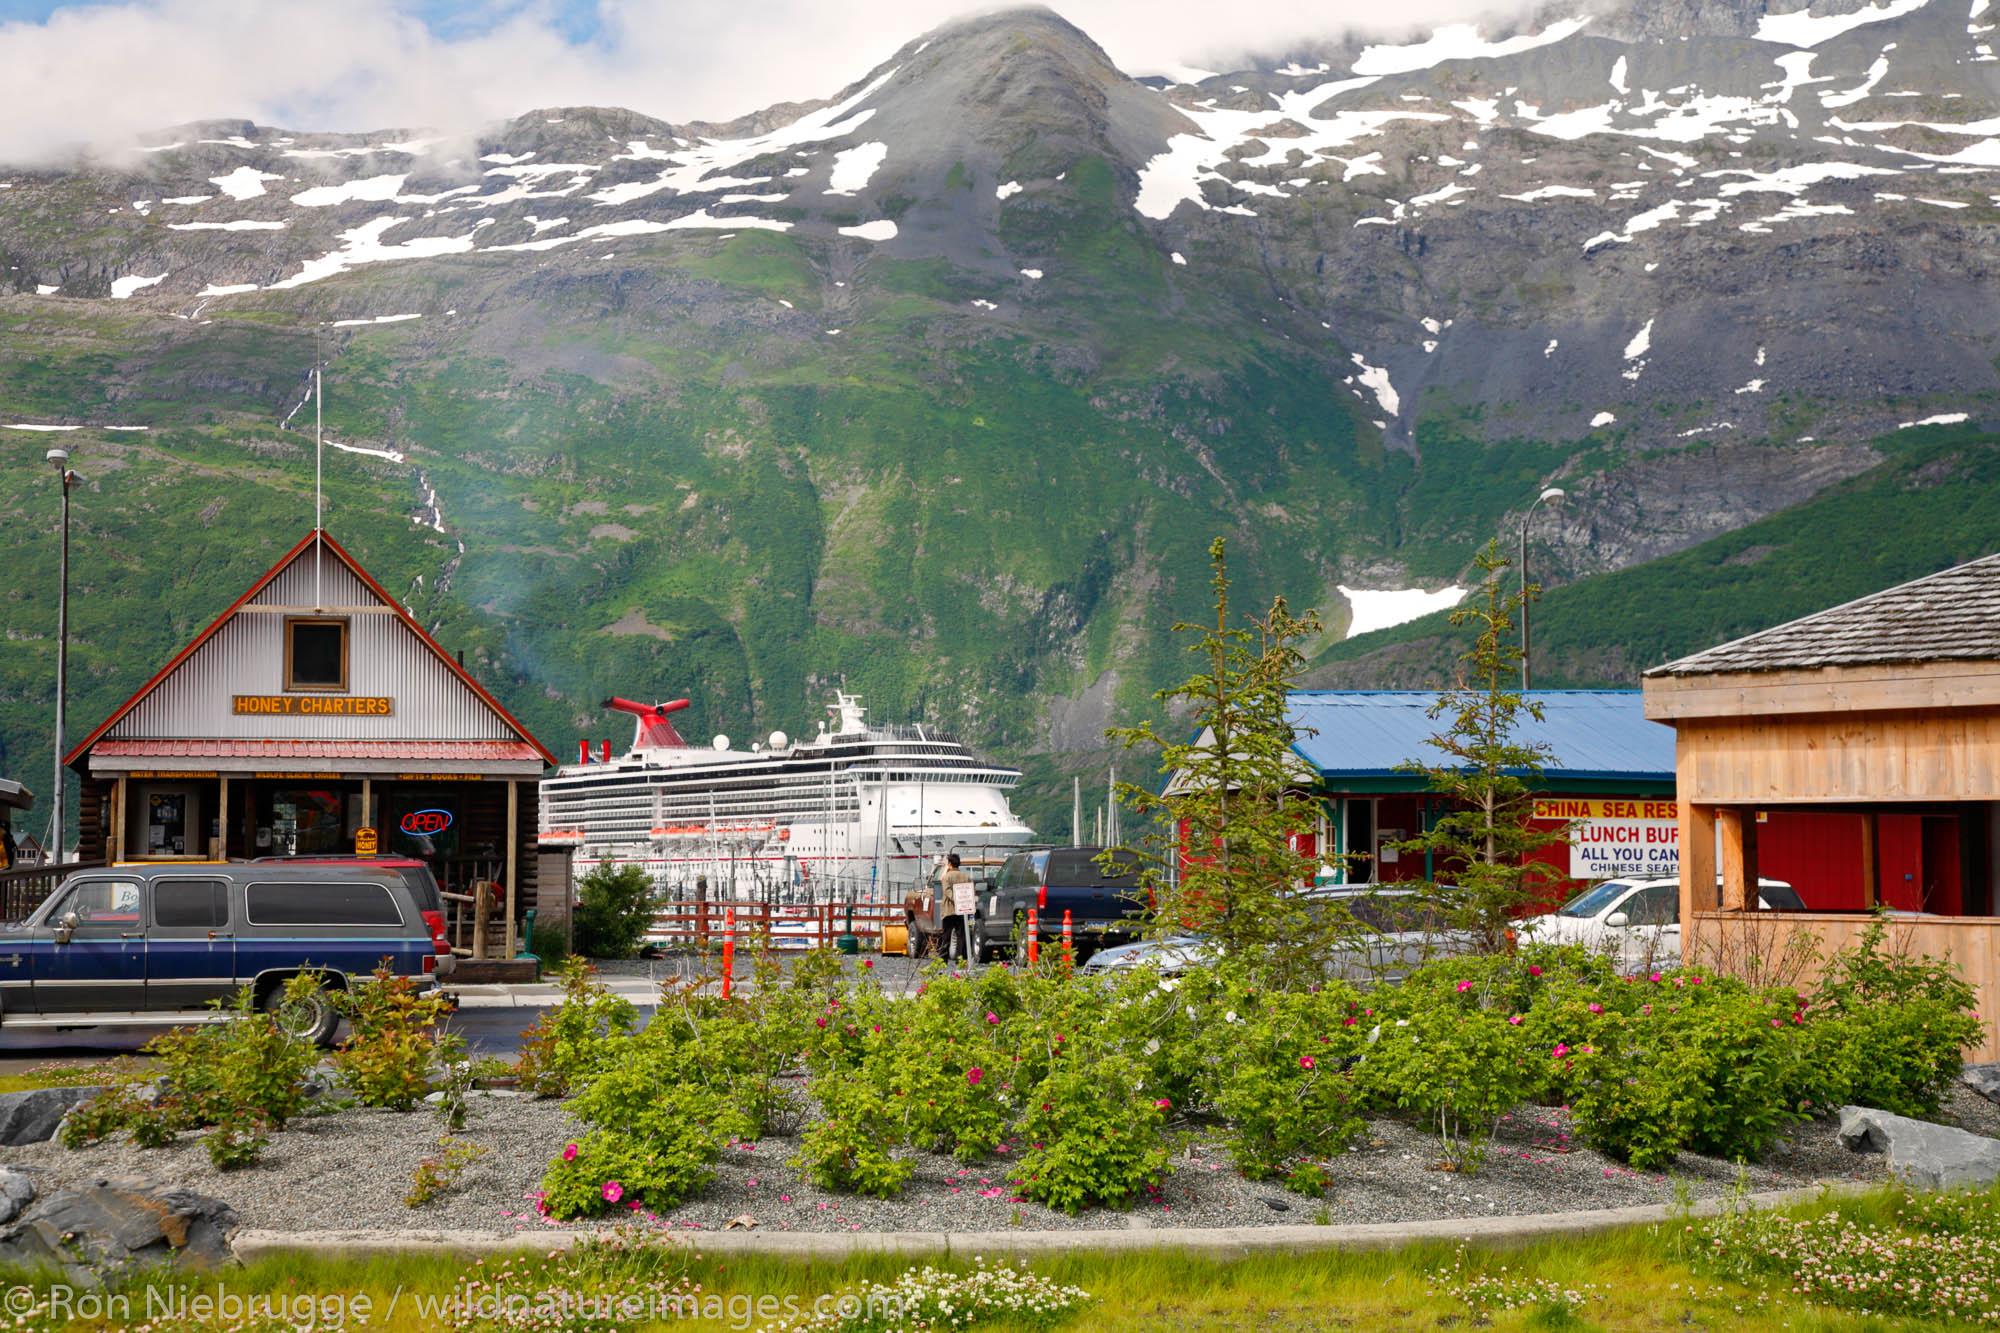 Whittier, Prince William Sound, Chugach National Forest, Alaska.